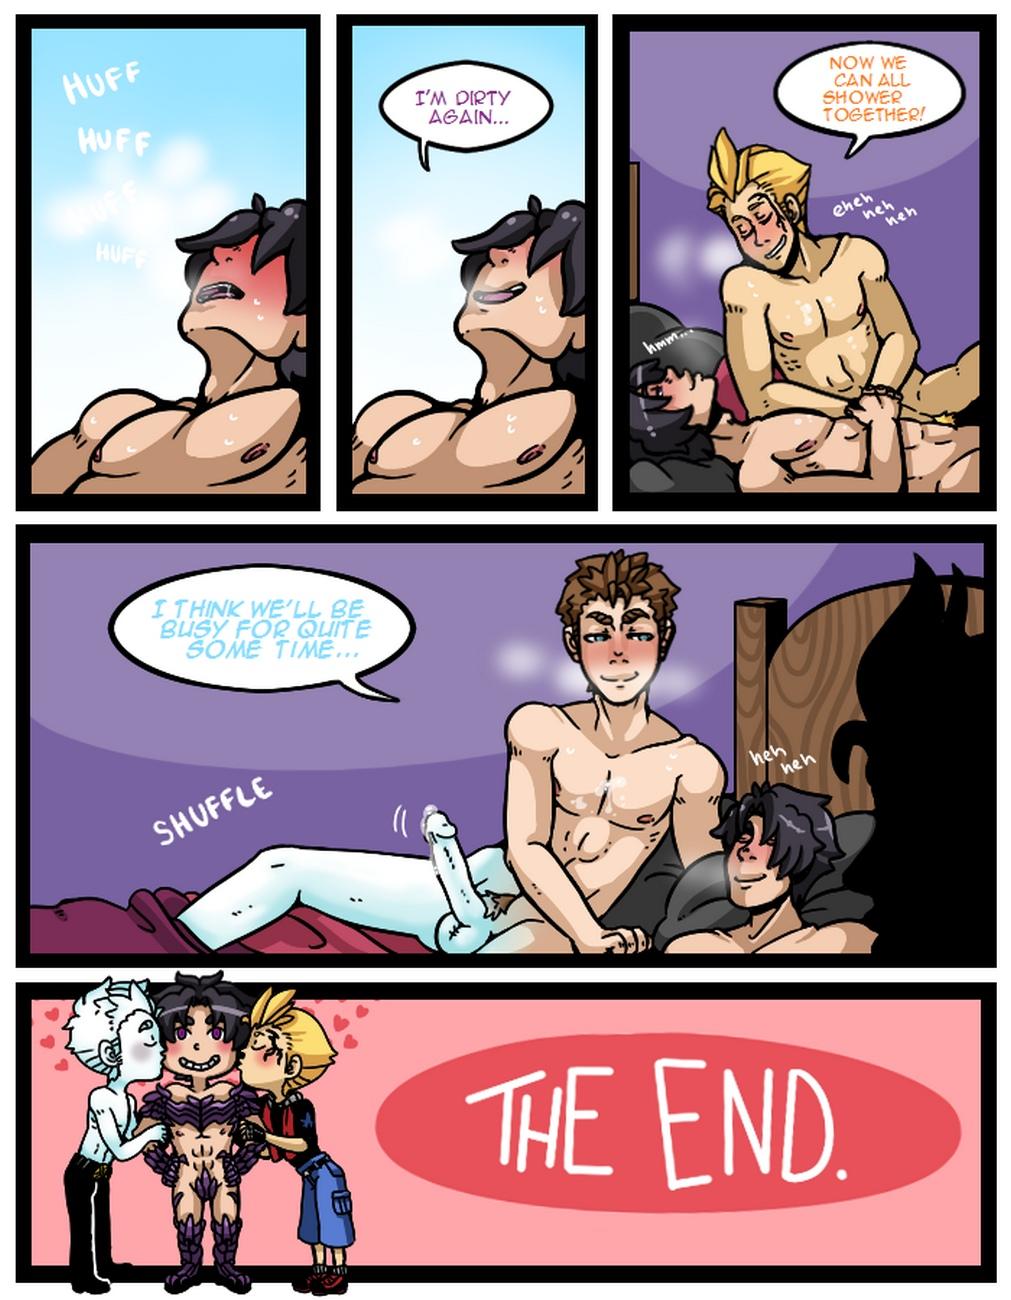 Good Morning gay furry comic